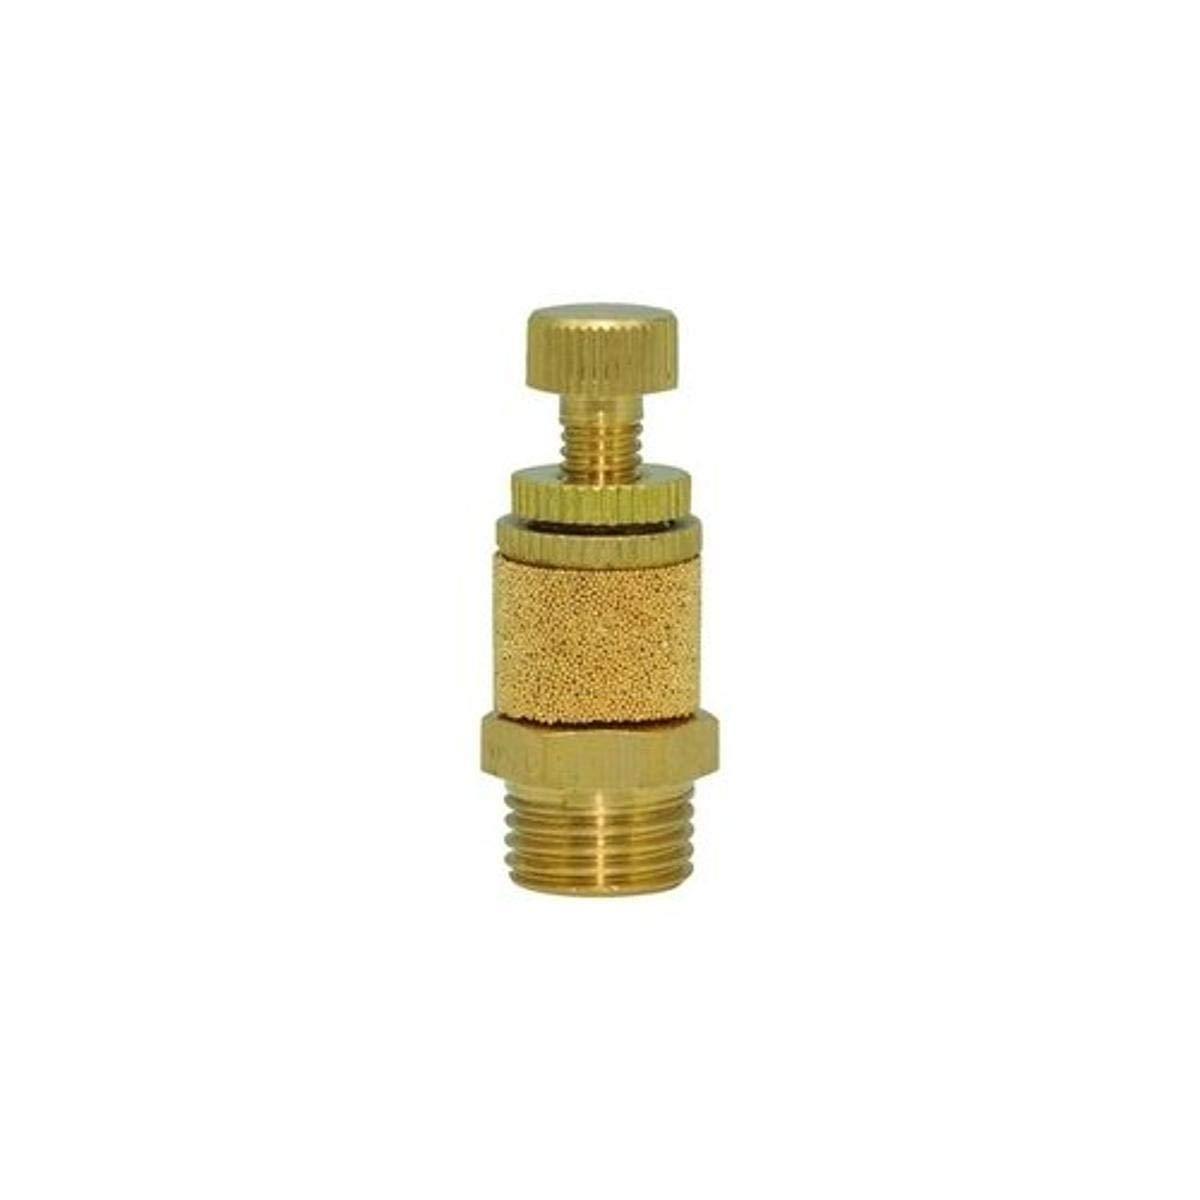 Spasm price Clippard SCM-Q Brass Speed Control Muffler Knurled NPT Kn 4